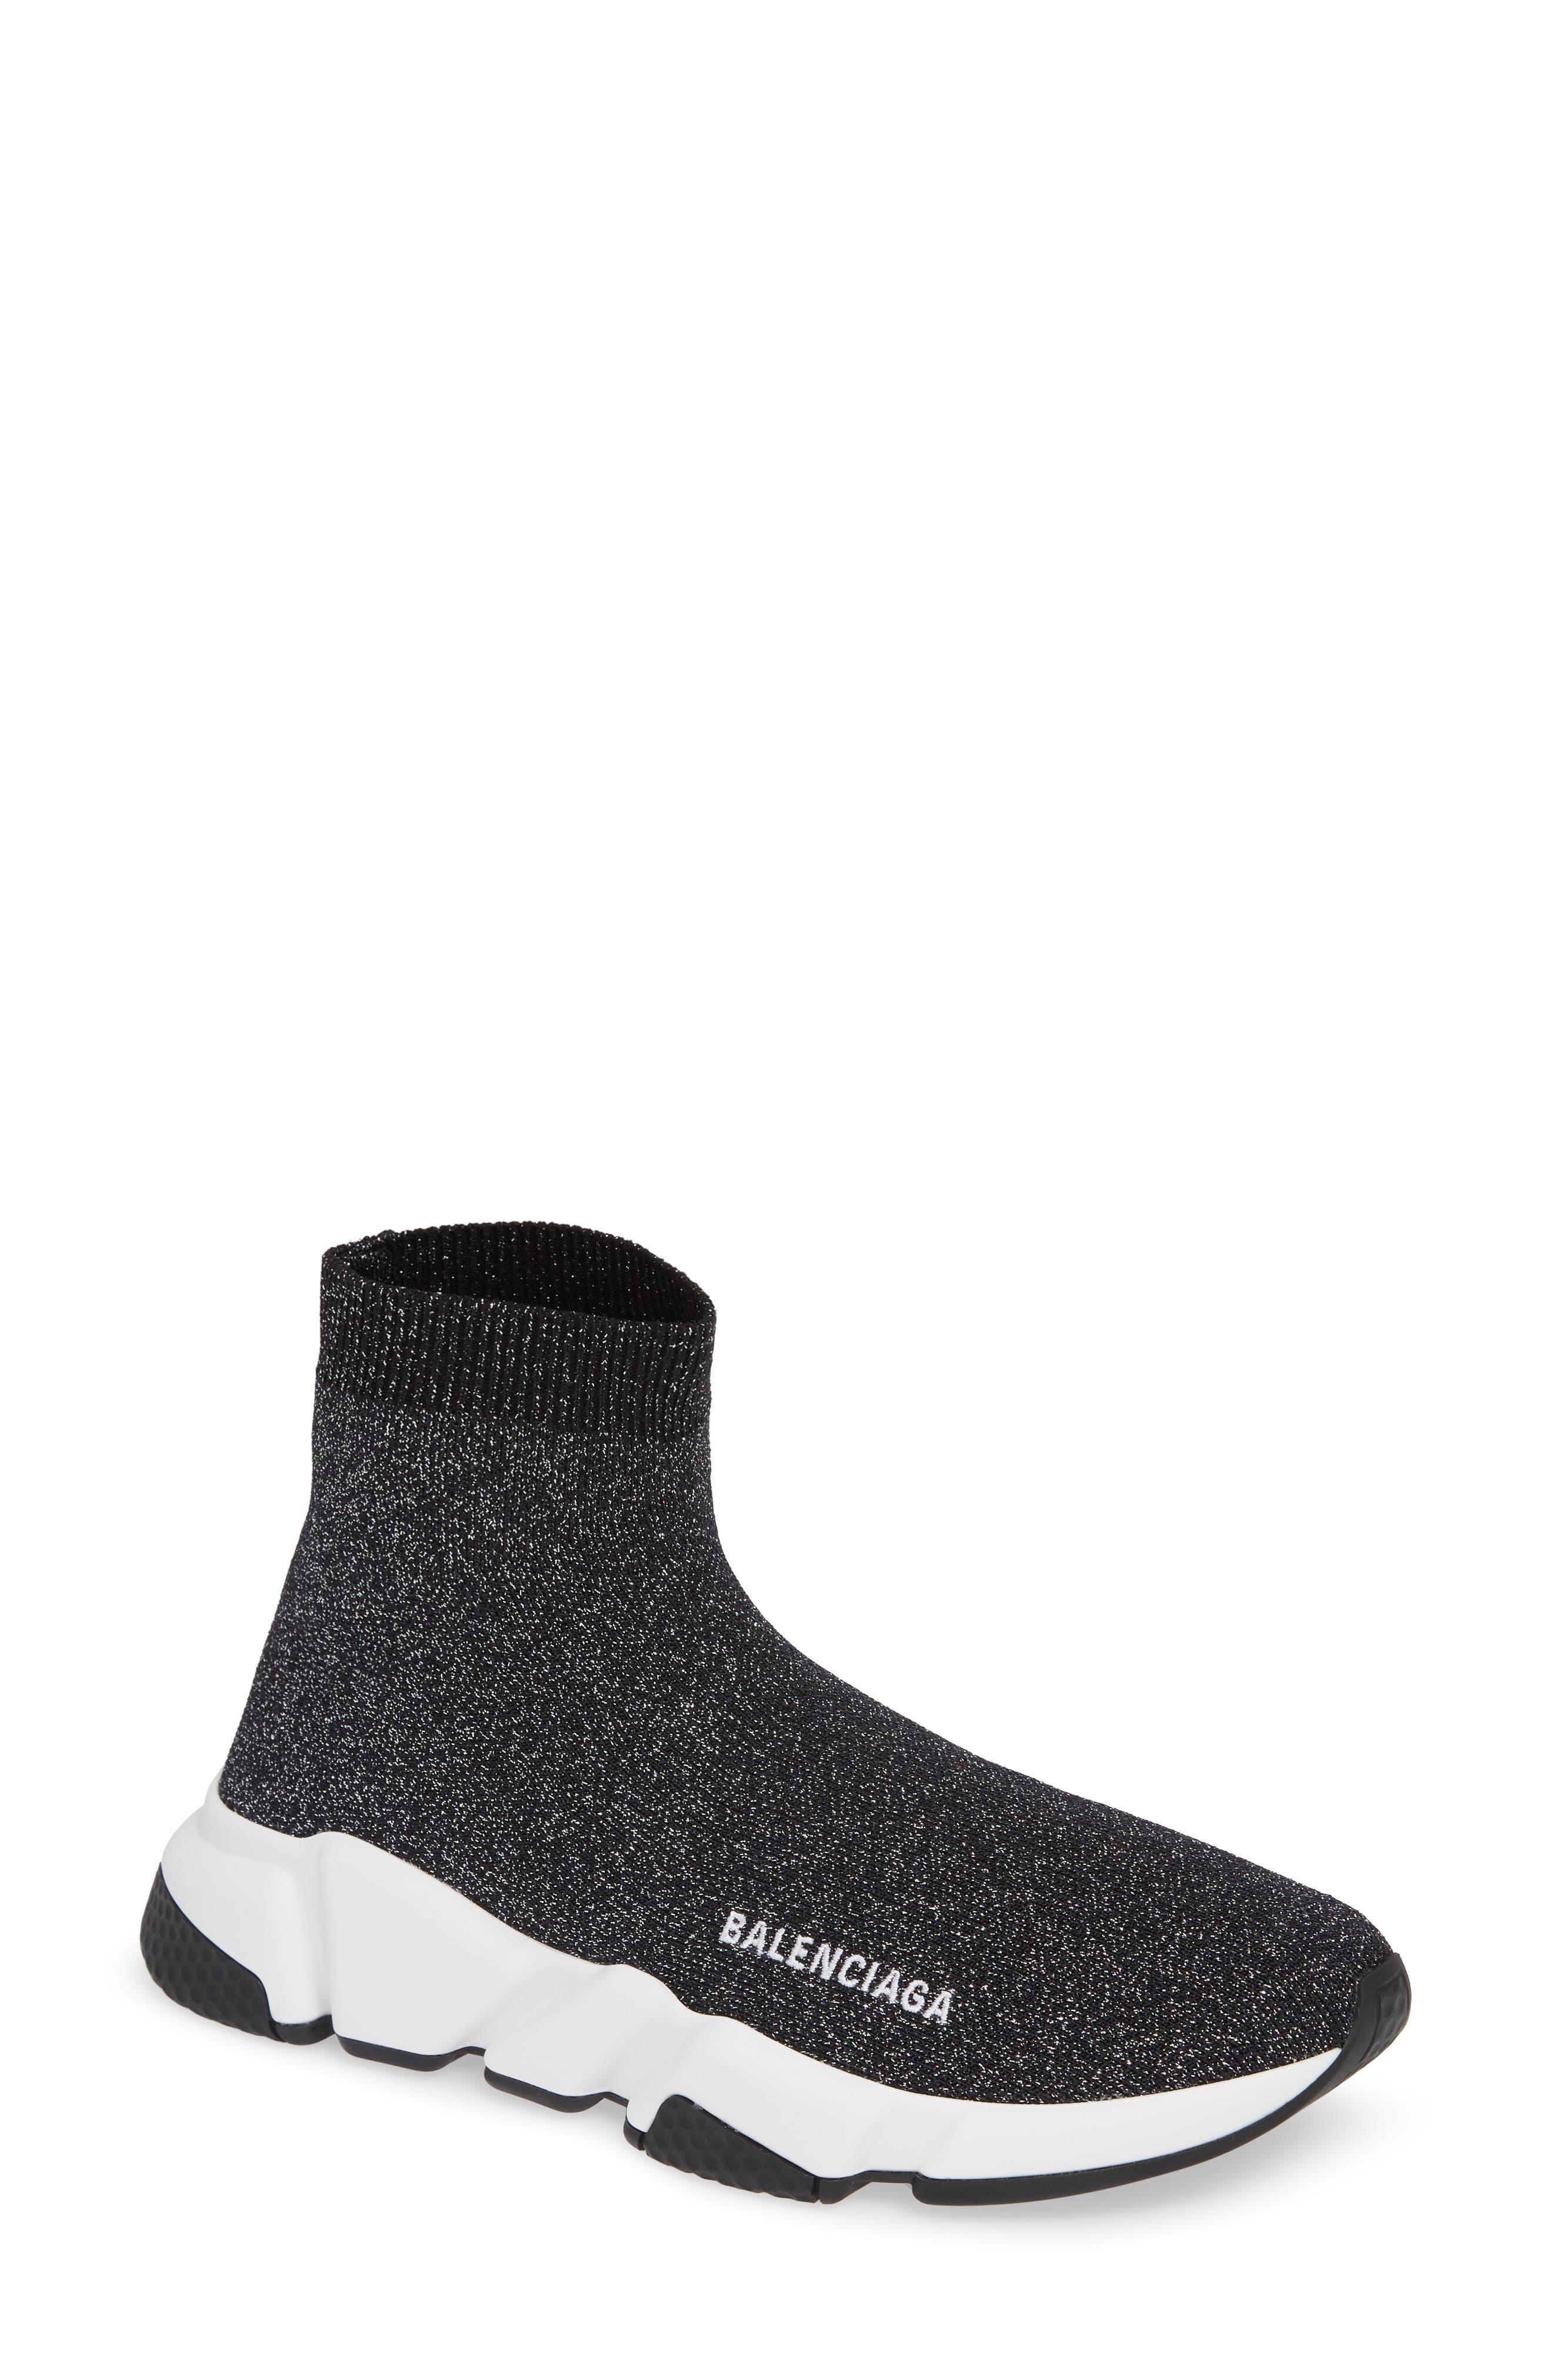 Speed Knit Sneaker,                             Main thumbnail 1, color,                             BLACK PEPPER